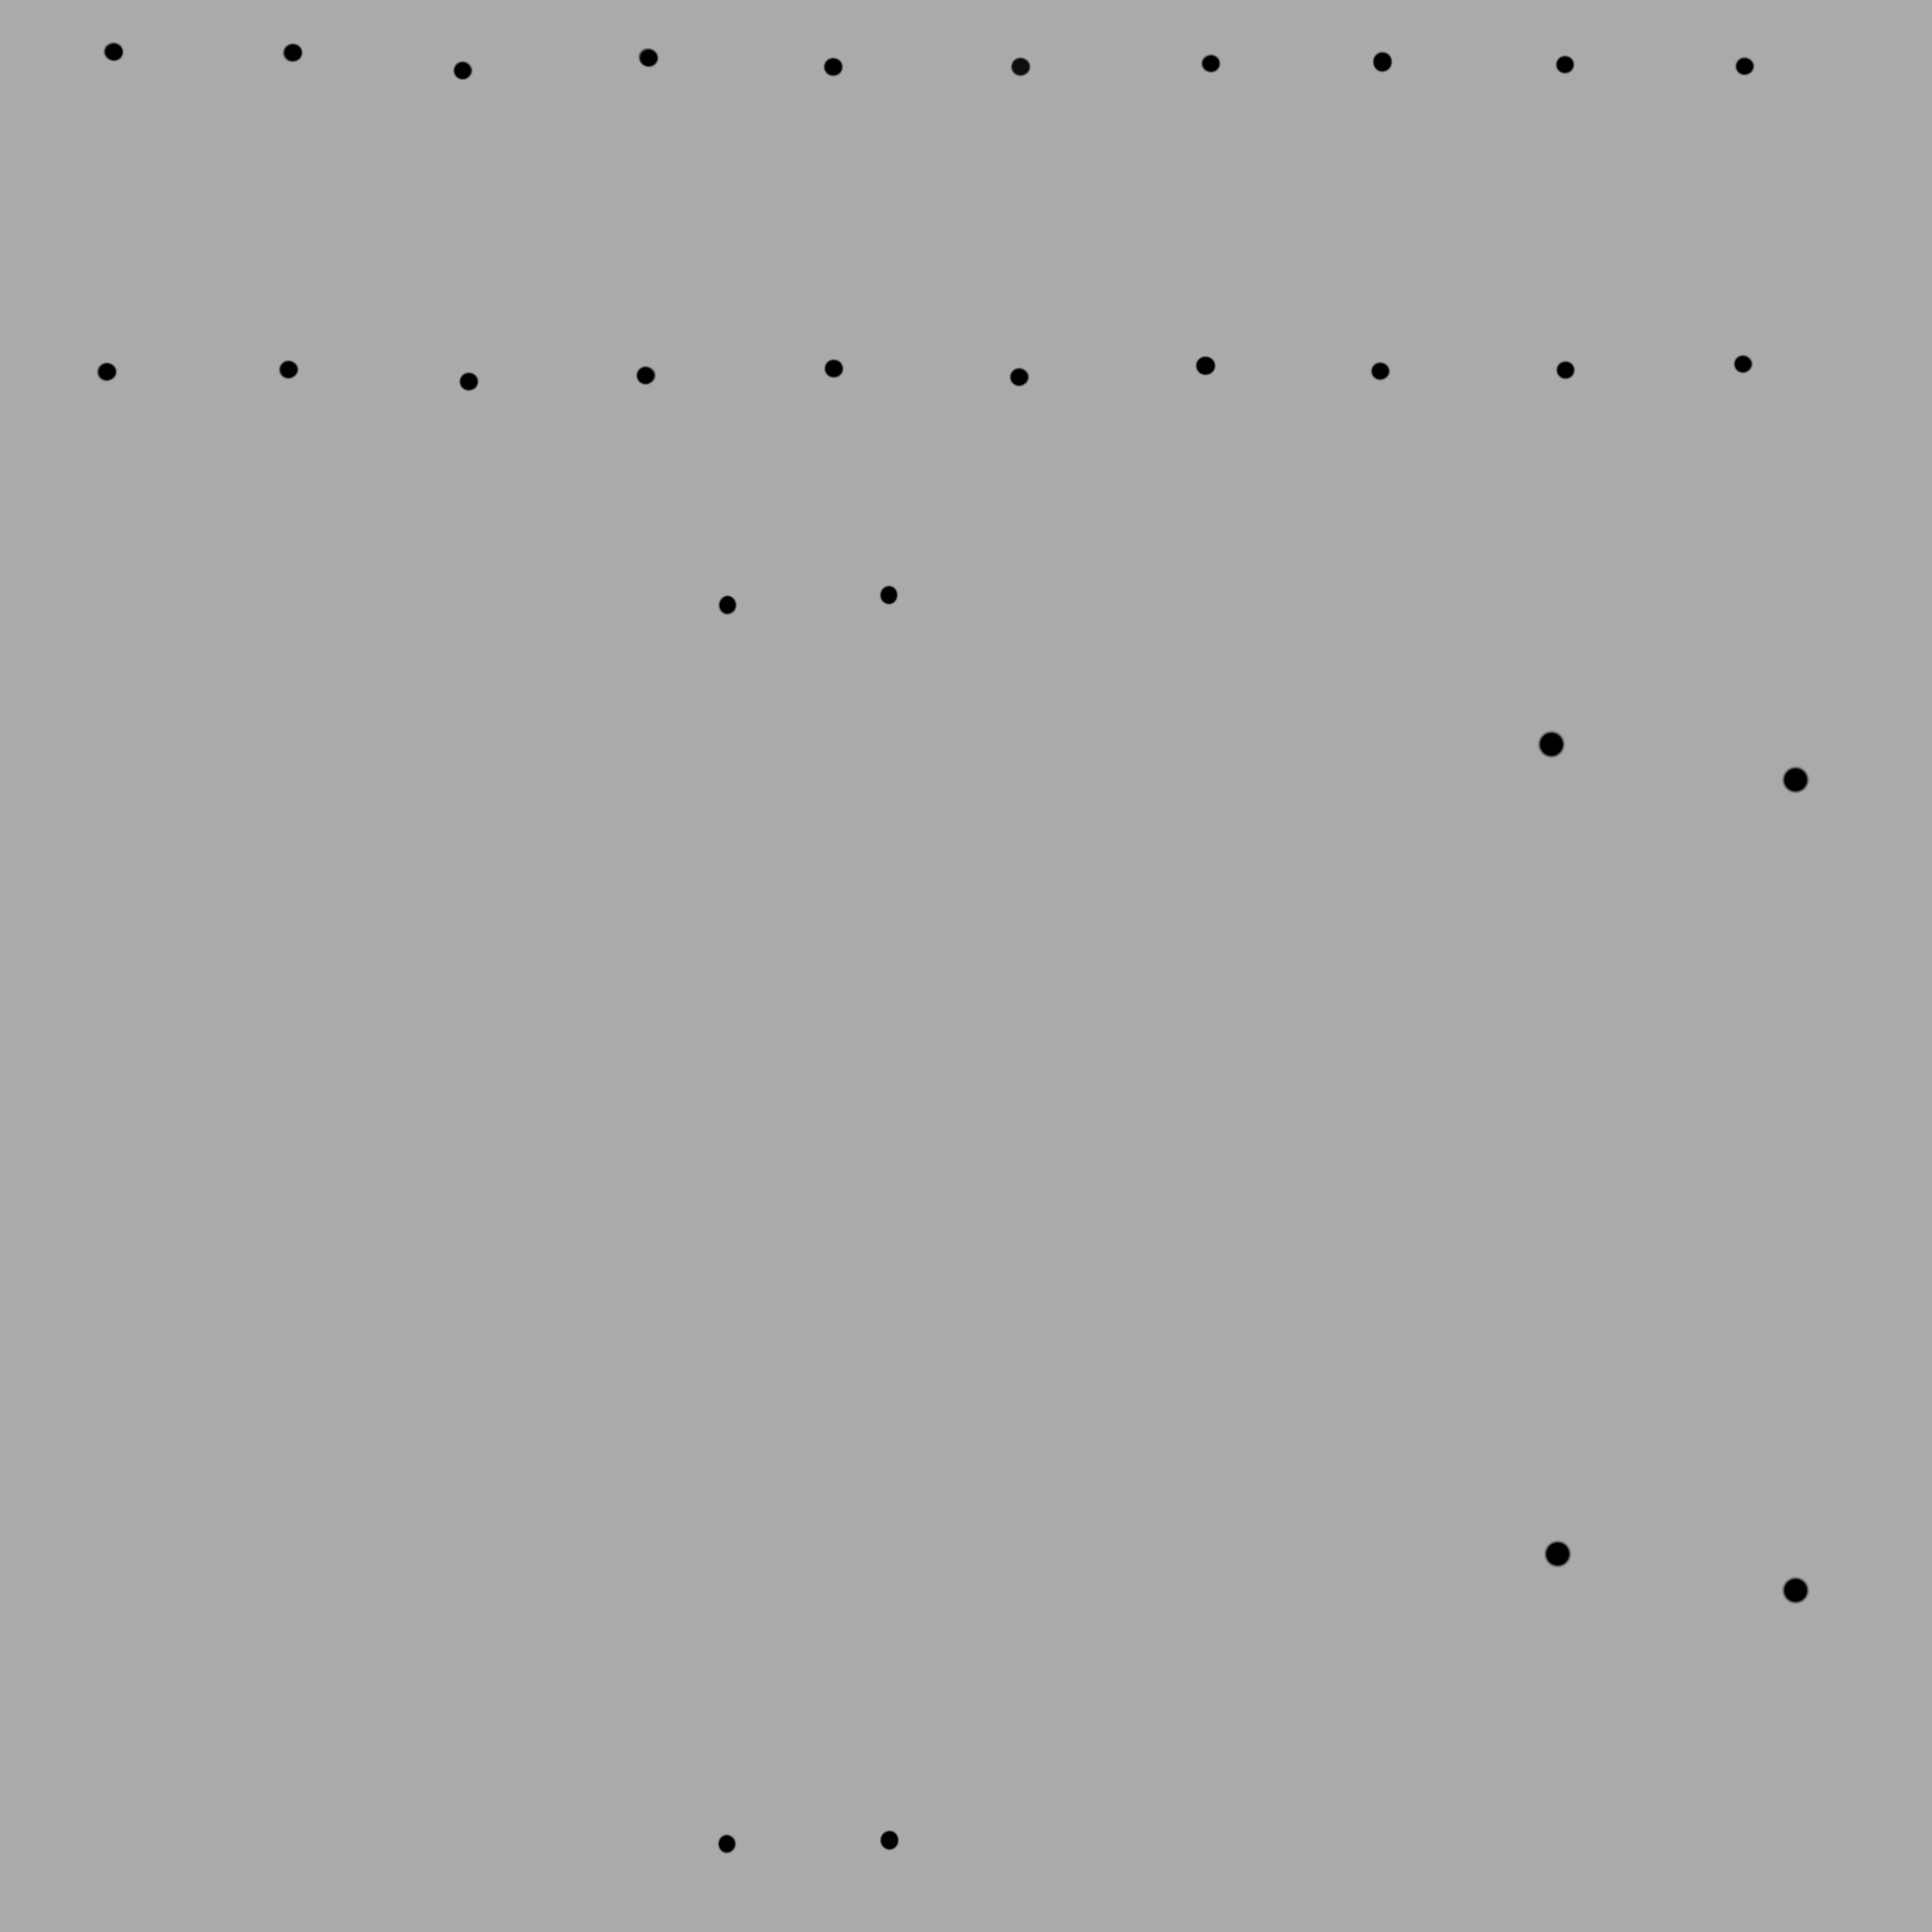 scaffoldA_uvSet_lambert5SG_ior.png